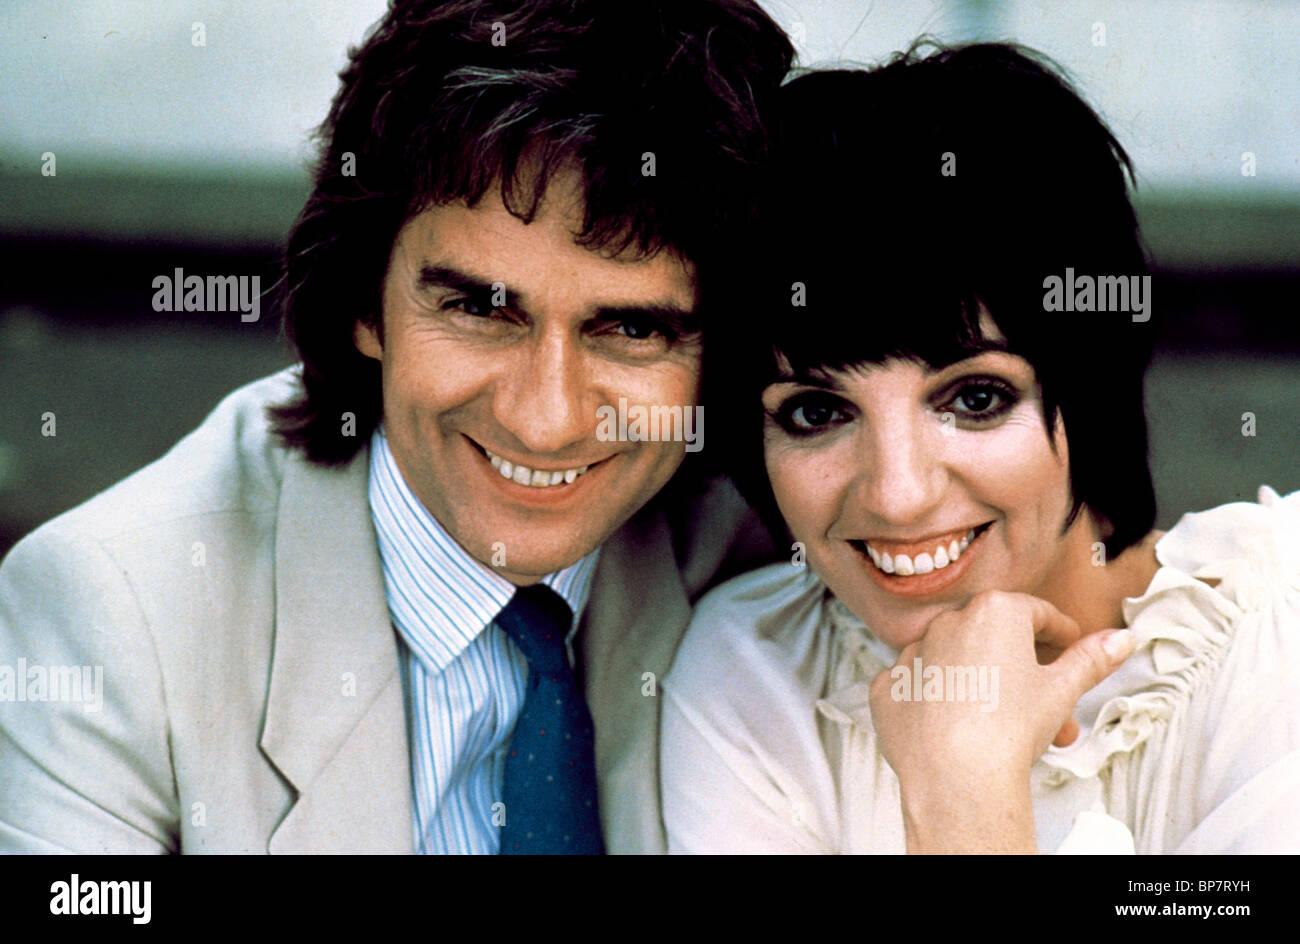 dudley moore amp liza minnelli arthur 1981 stock photo